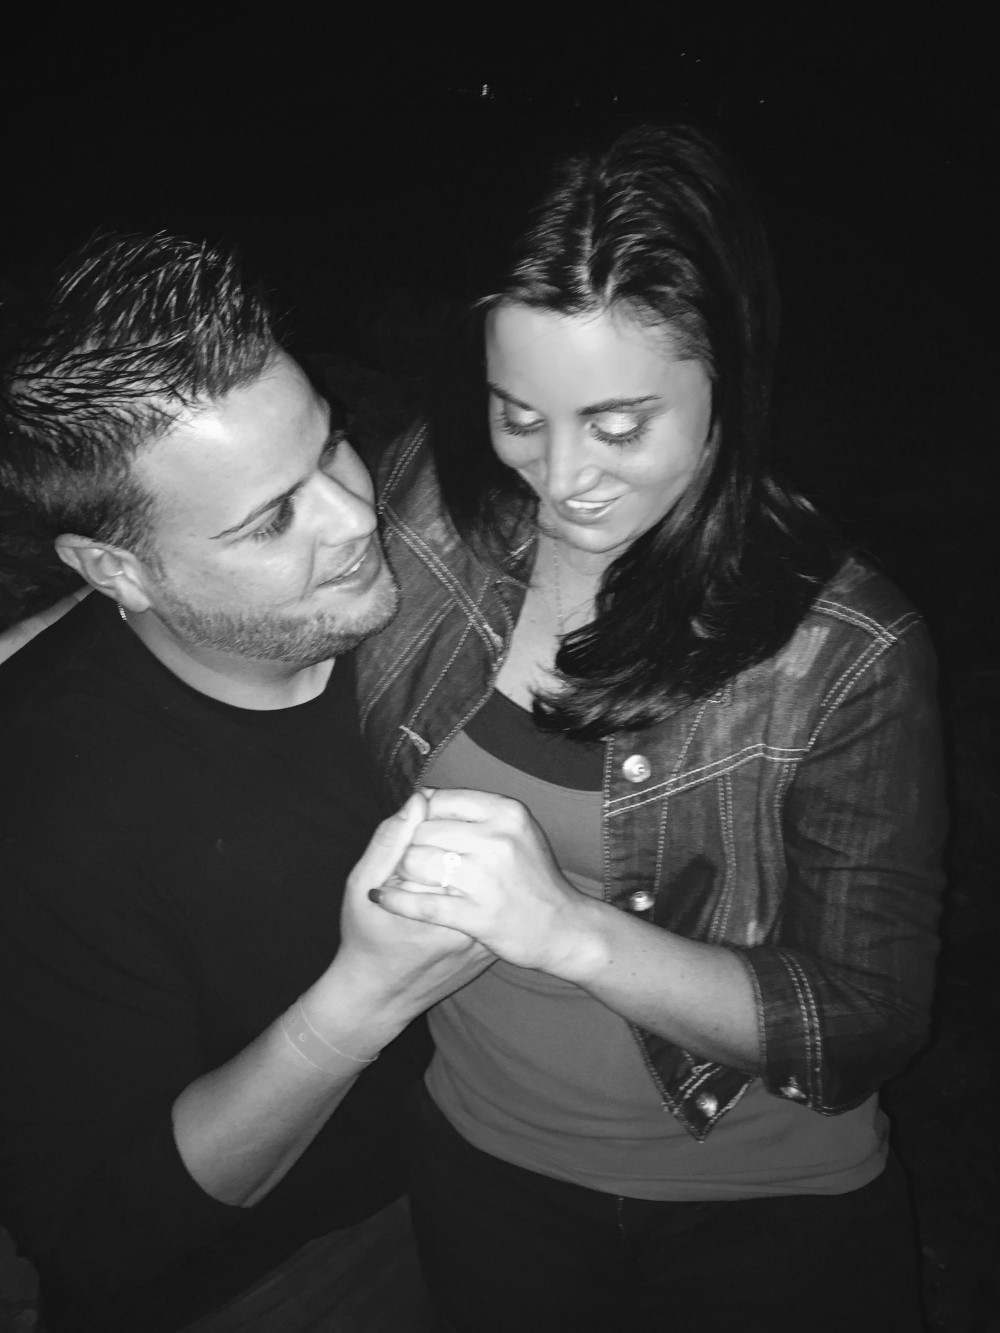 Image 1 of Amanda and Frank